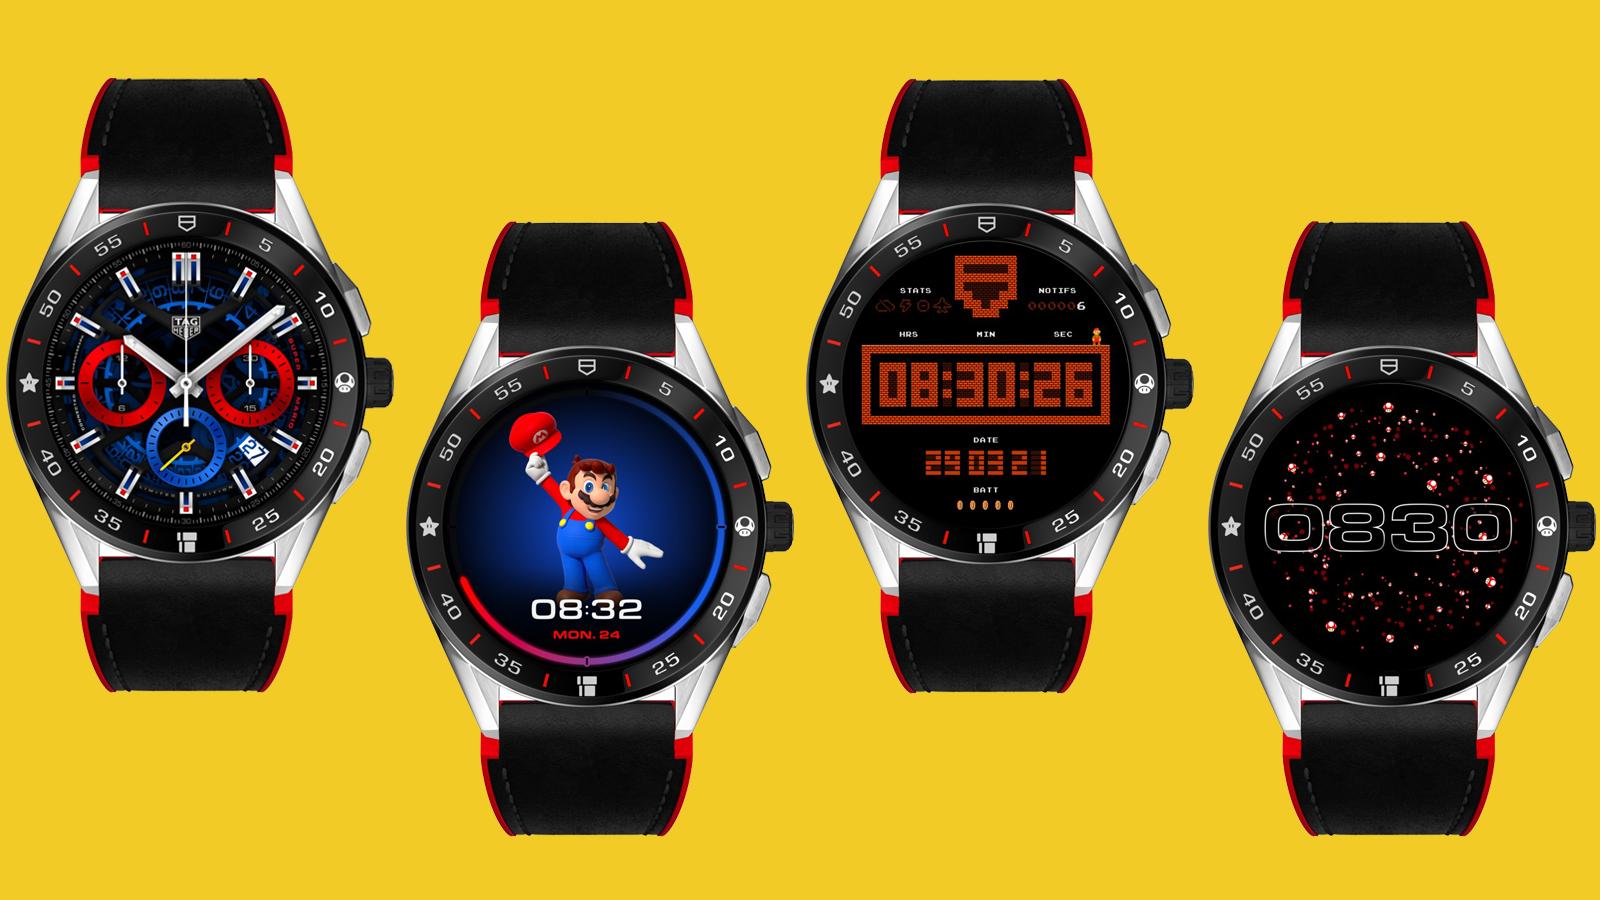 Four views of TAG Heuer x Super Mario watchface